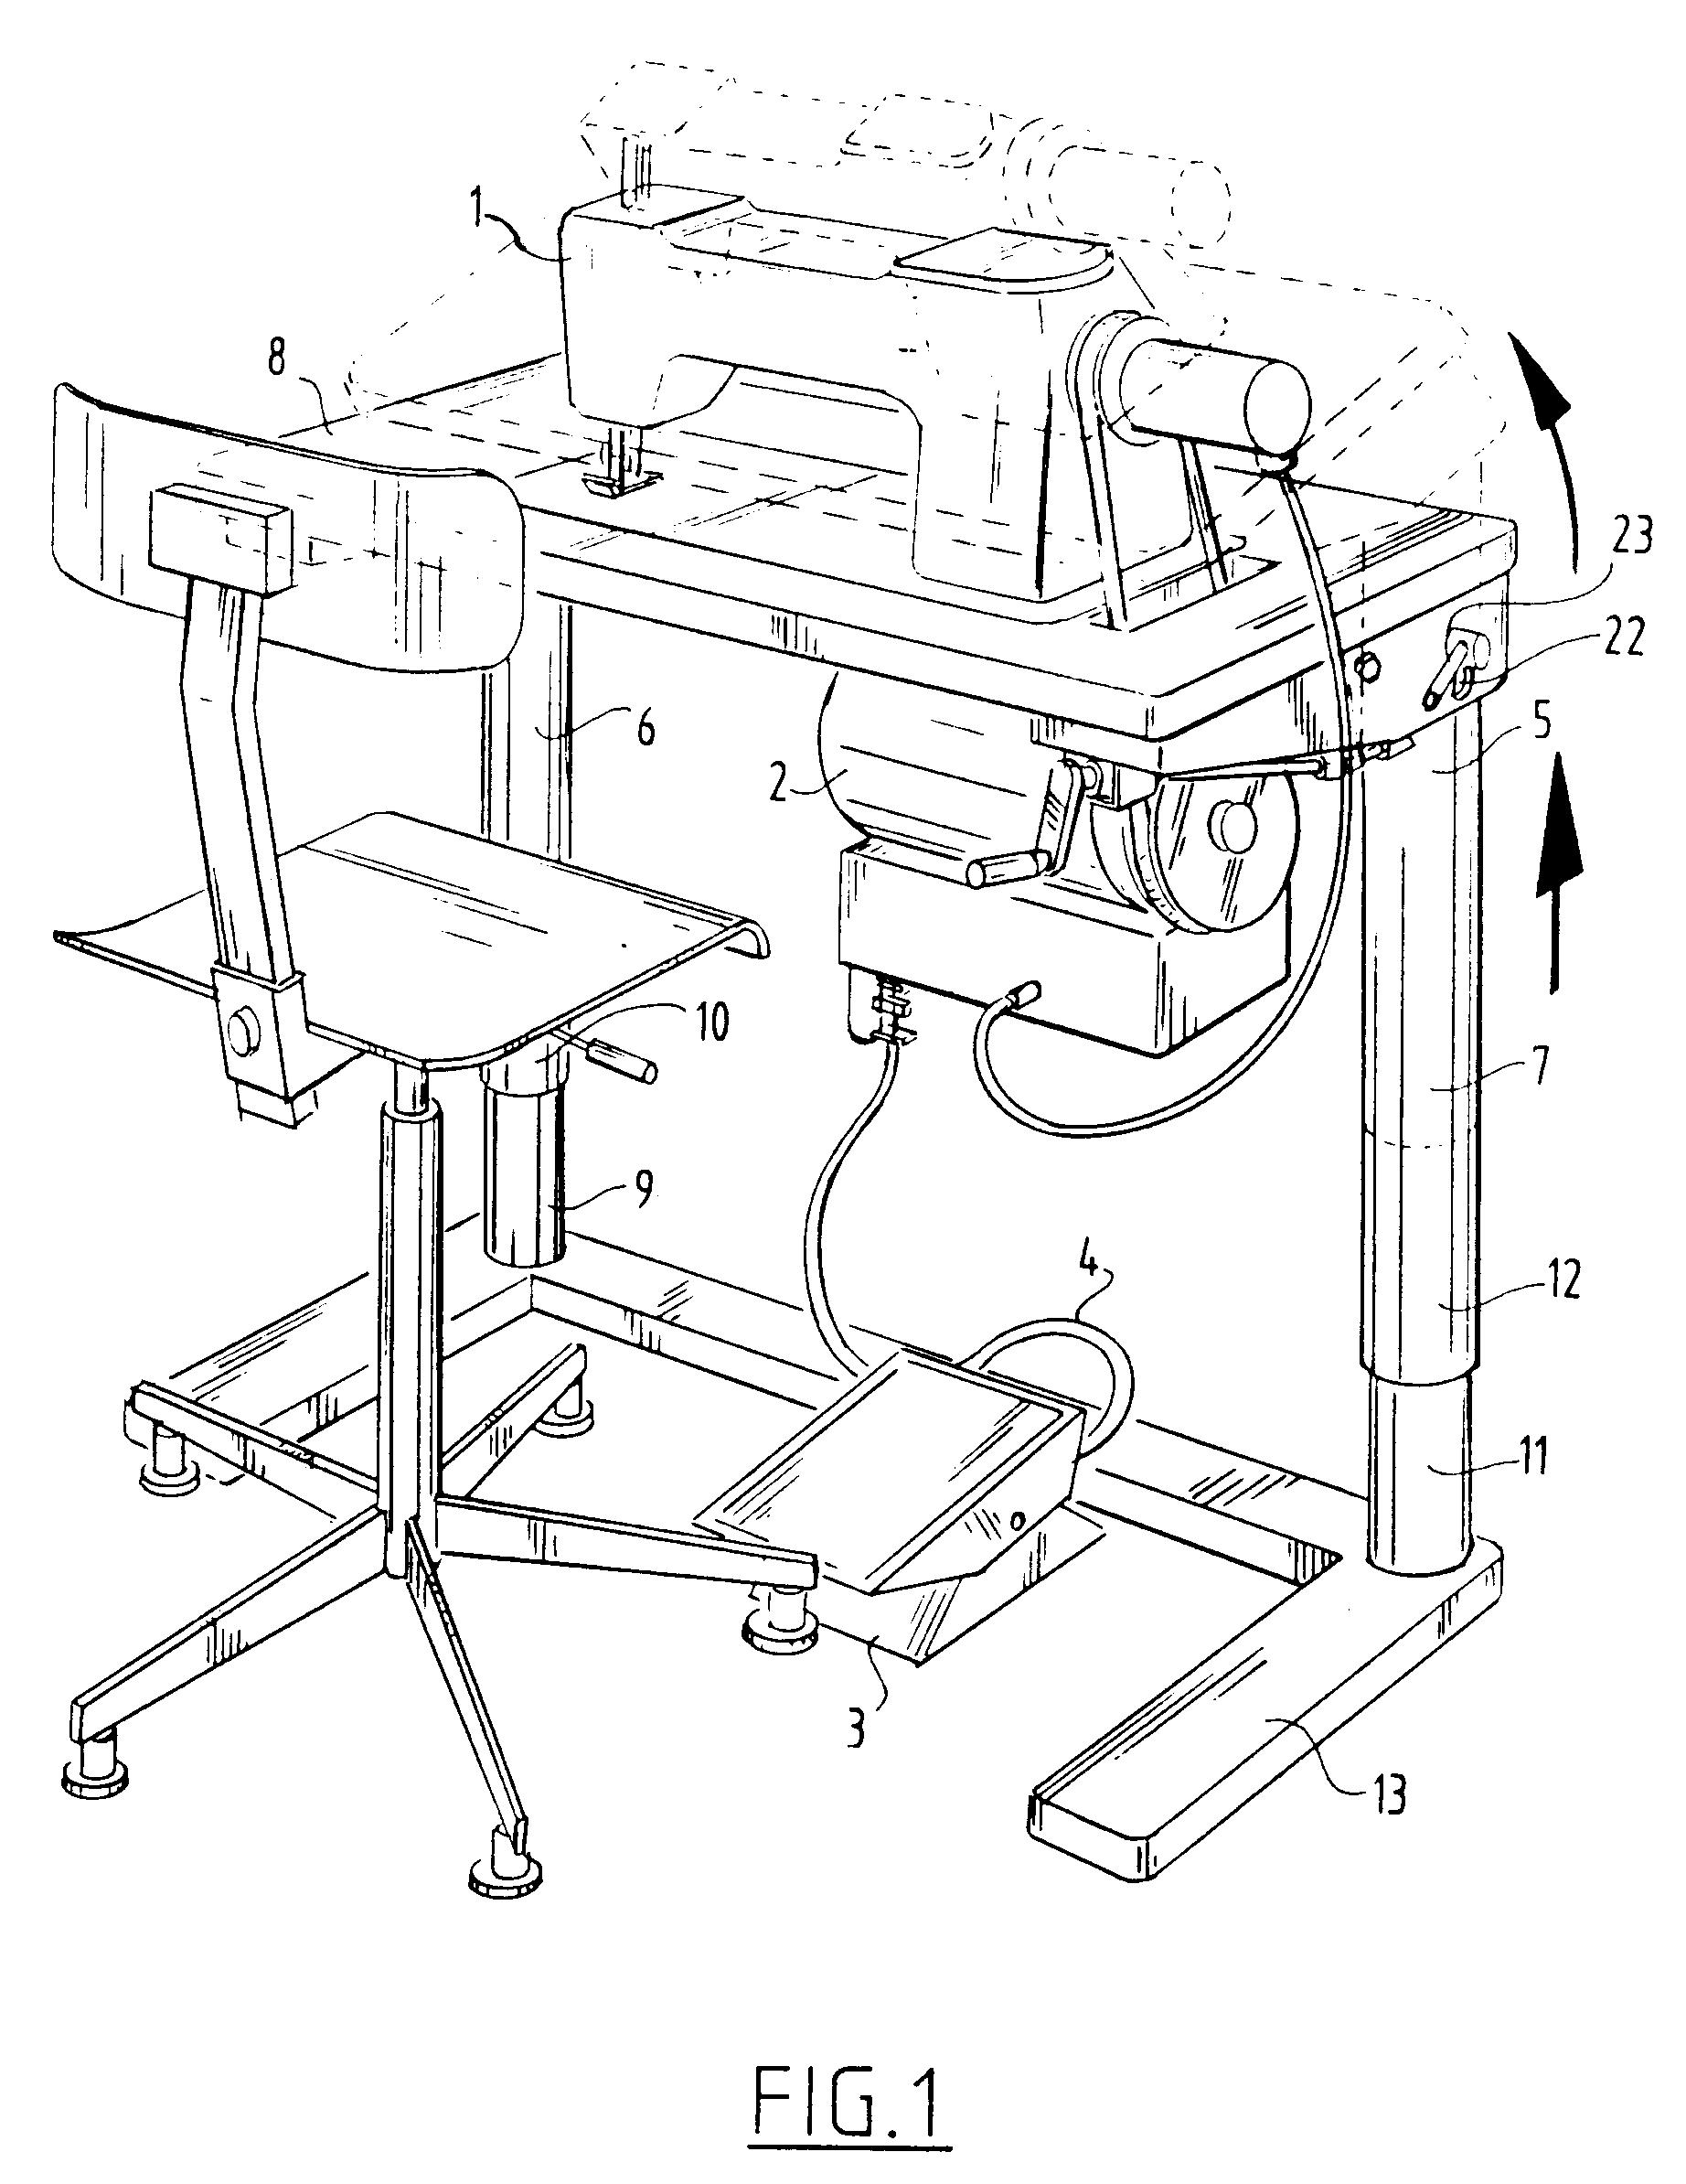 sewing machine parts diagram spinning wheel parts diagram elsavadorla. Black Bedroom Furniture Sets. Home Design Ideas